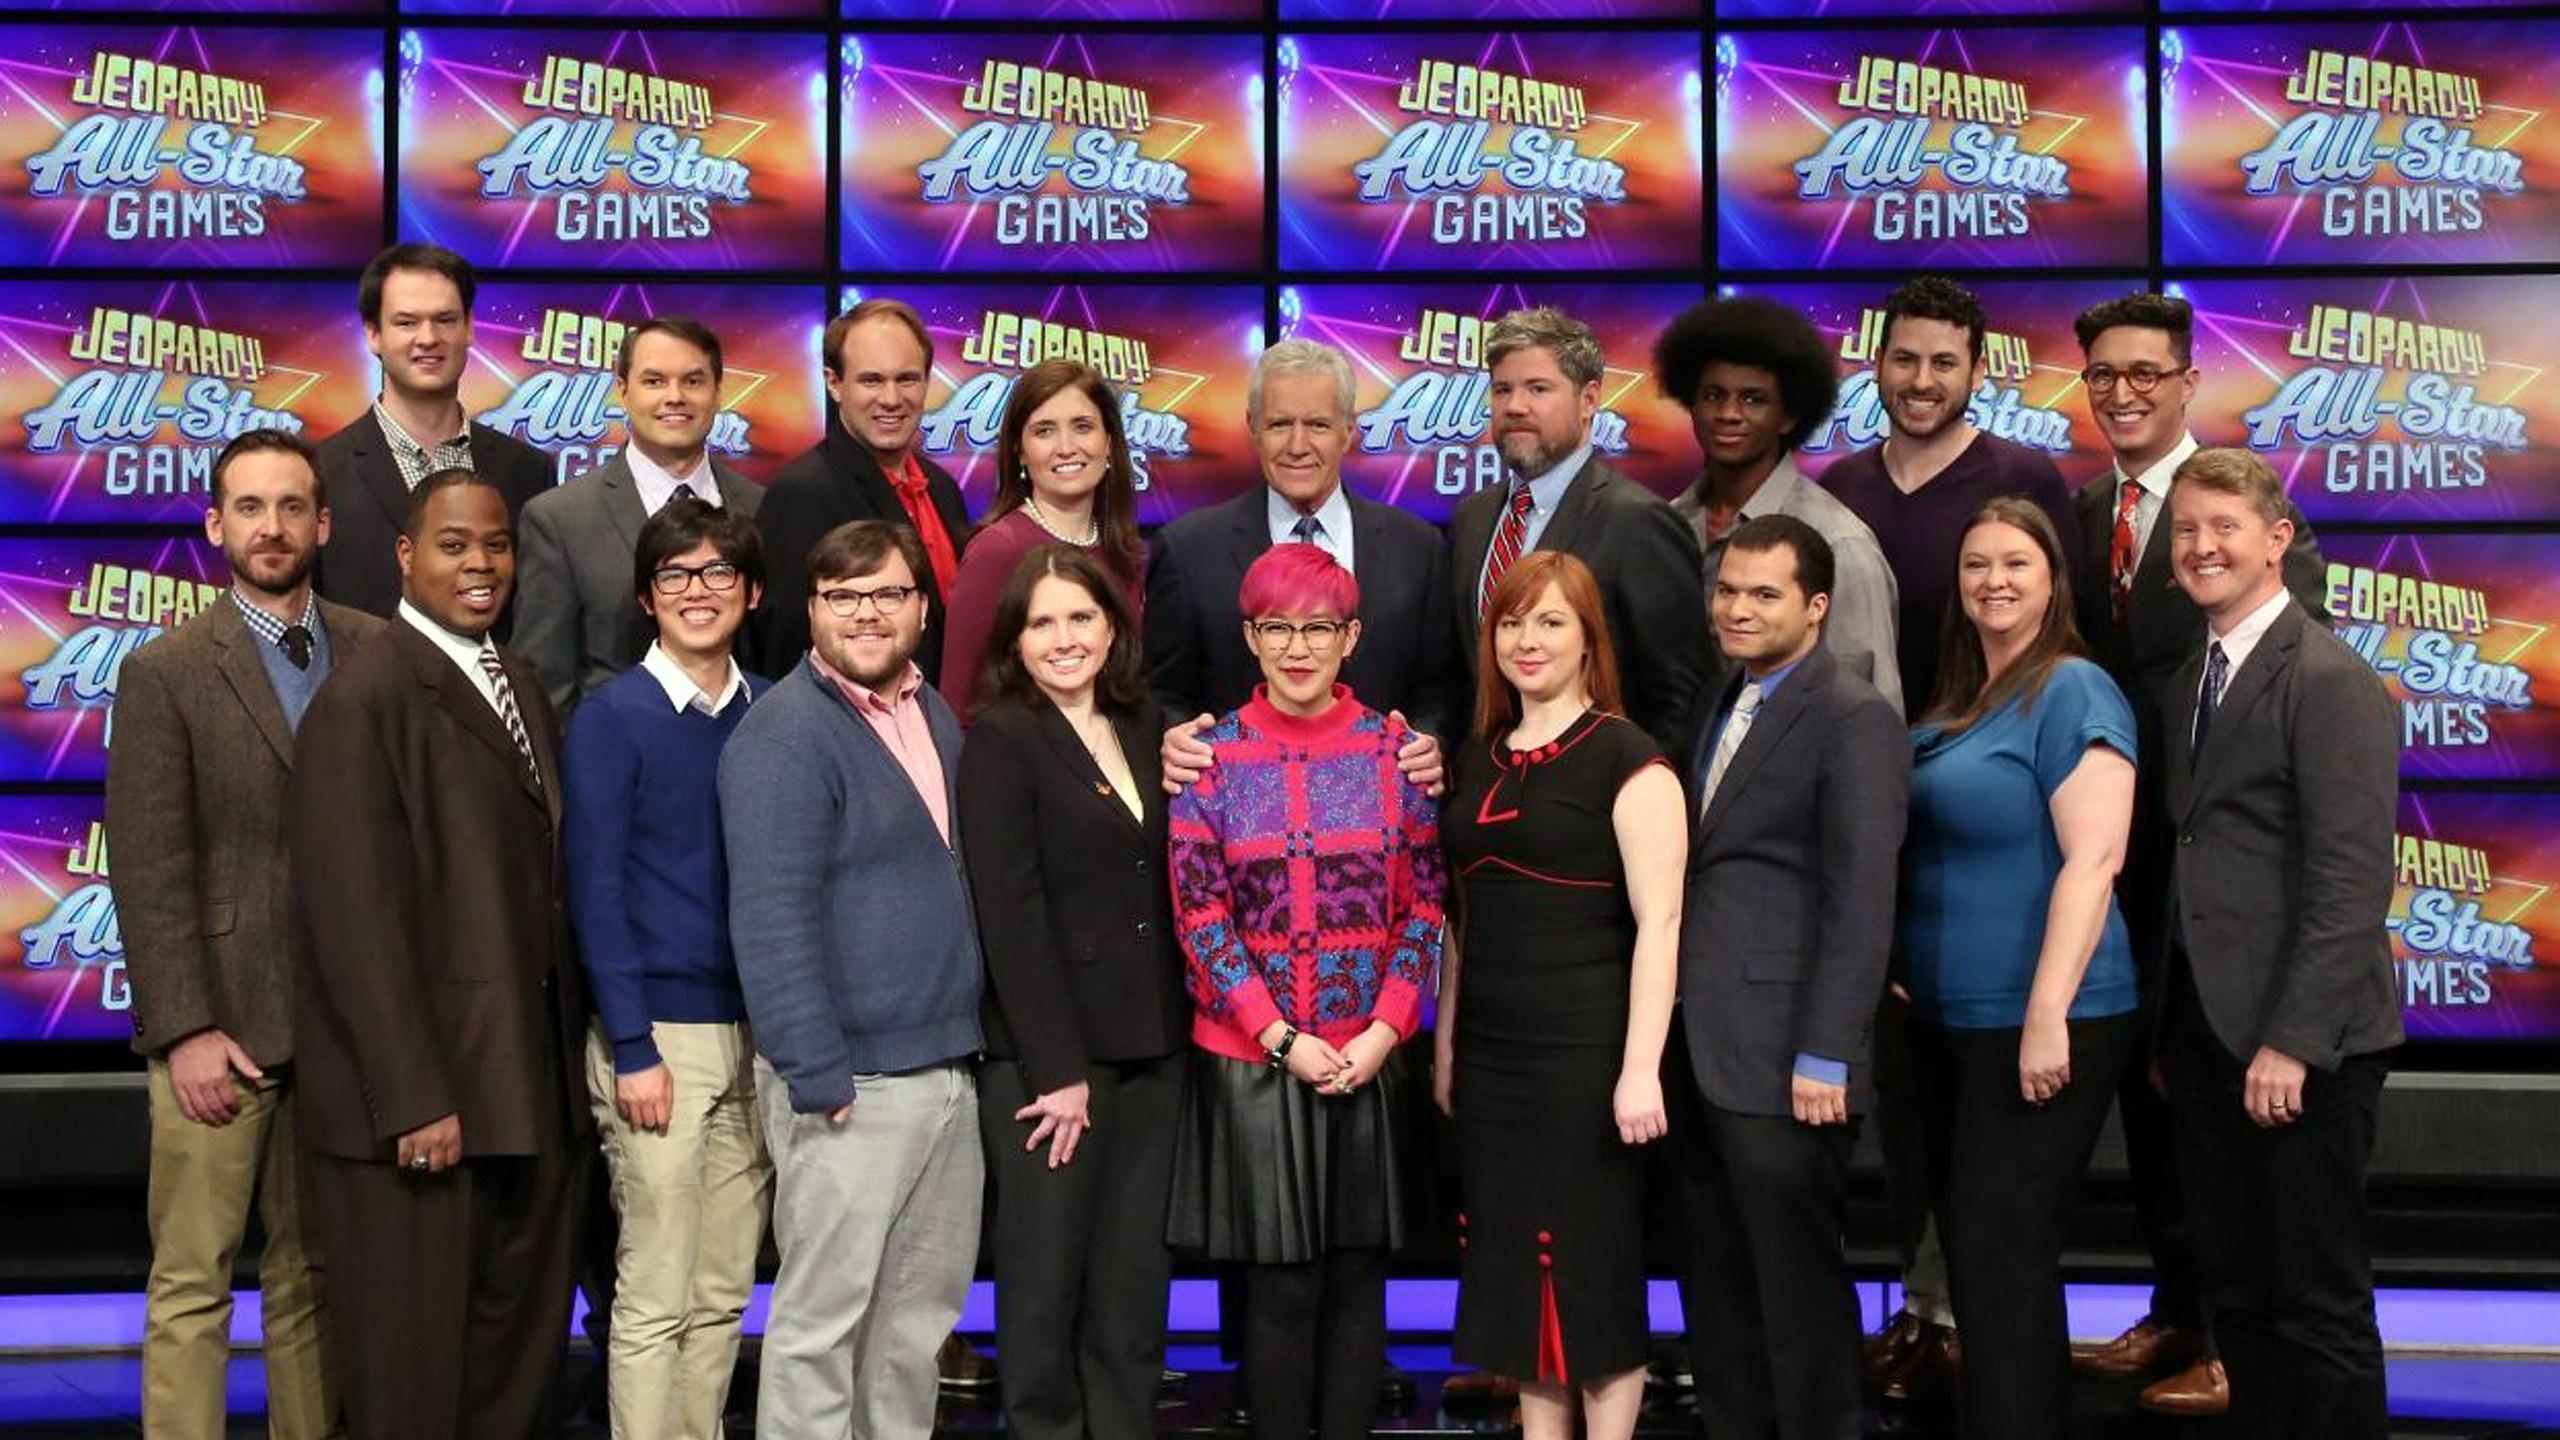 Jeopardy team All Stars